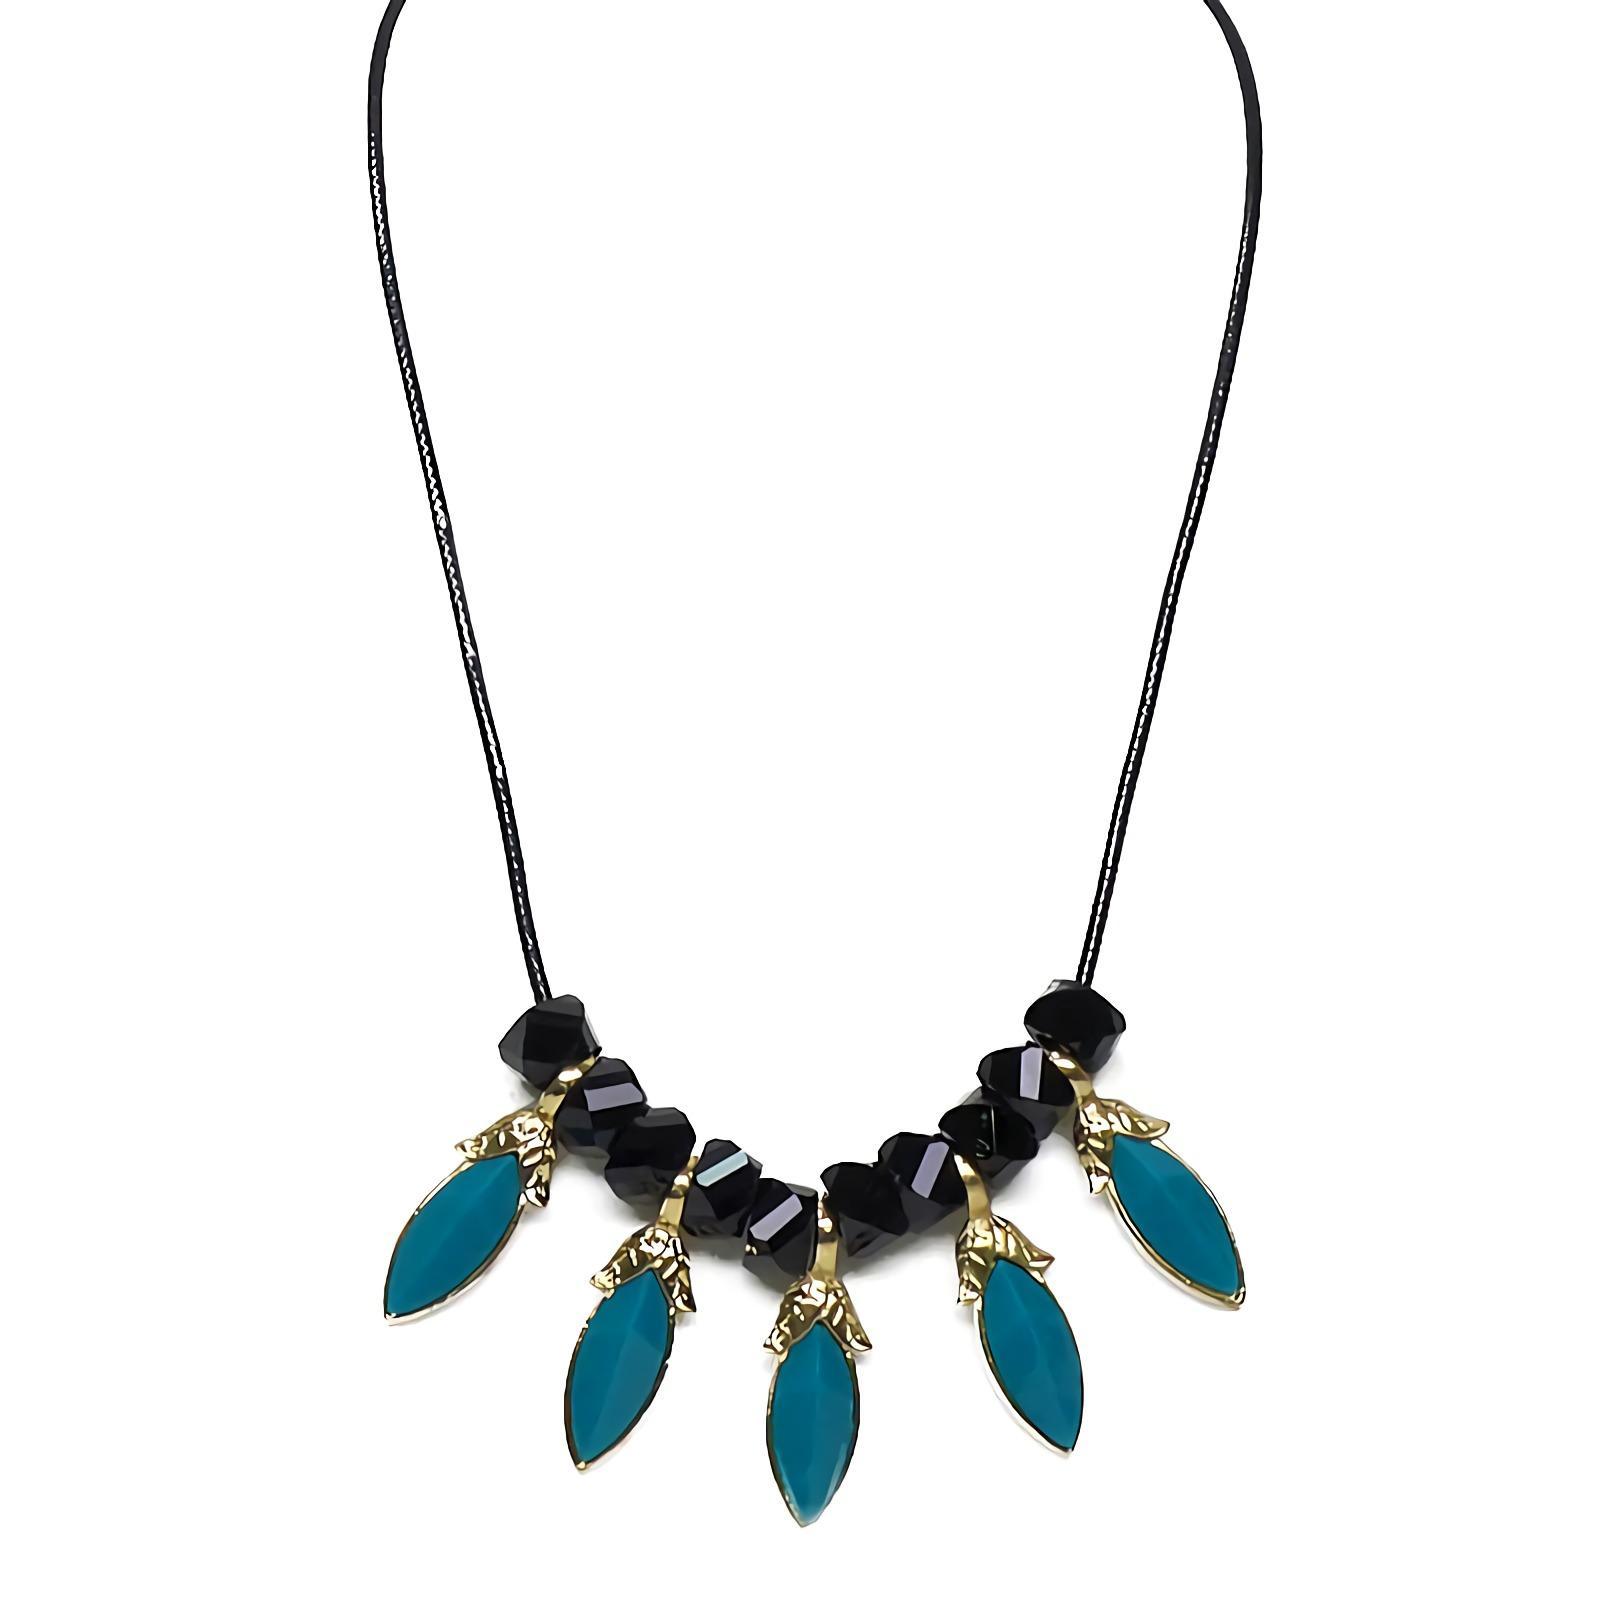 OFASHION Aksesoris Kalung CA-180314-K012 Necklace Fashion Xuping Jewelry Hitam Biru